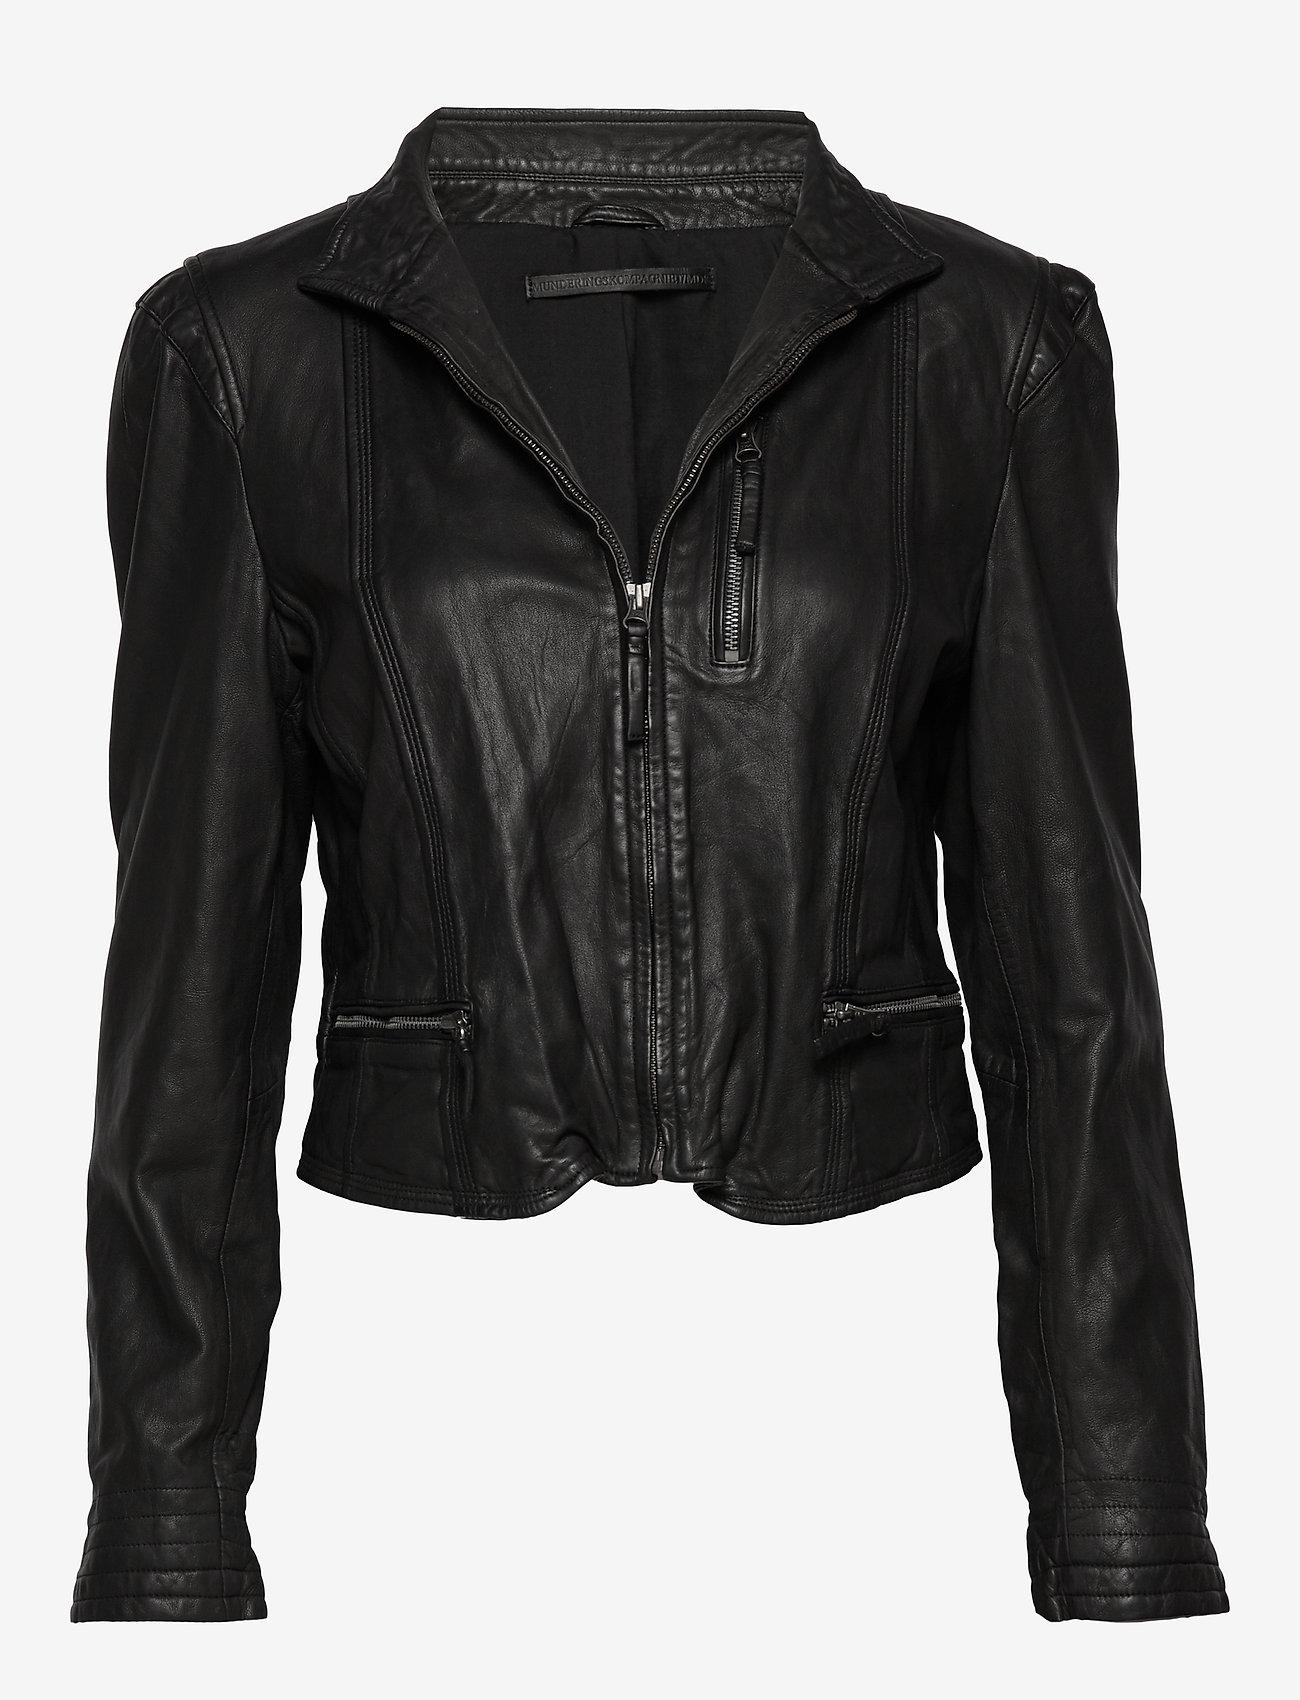 MDK / Munderingskompagniet - Rucy leather jacket (black) - nahkatakit - black - 0